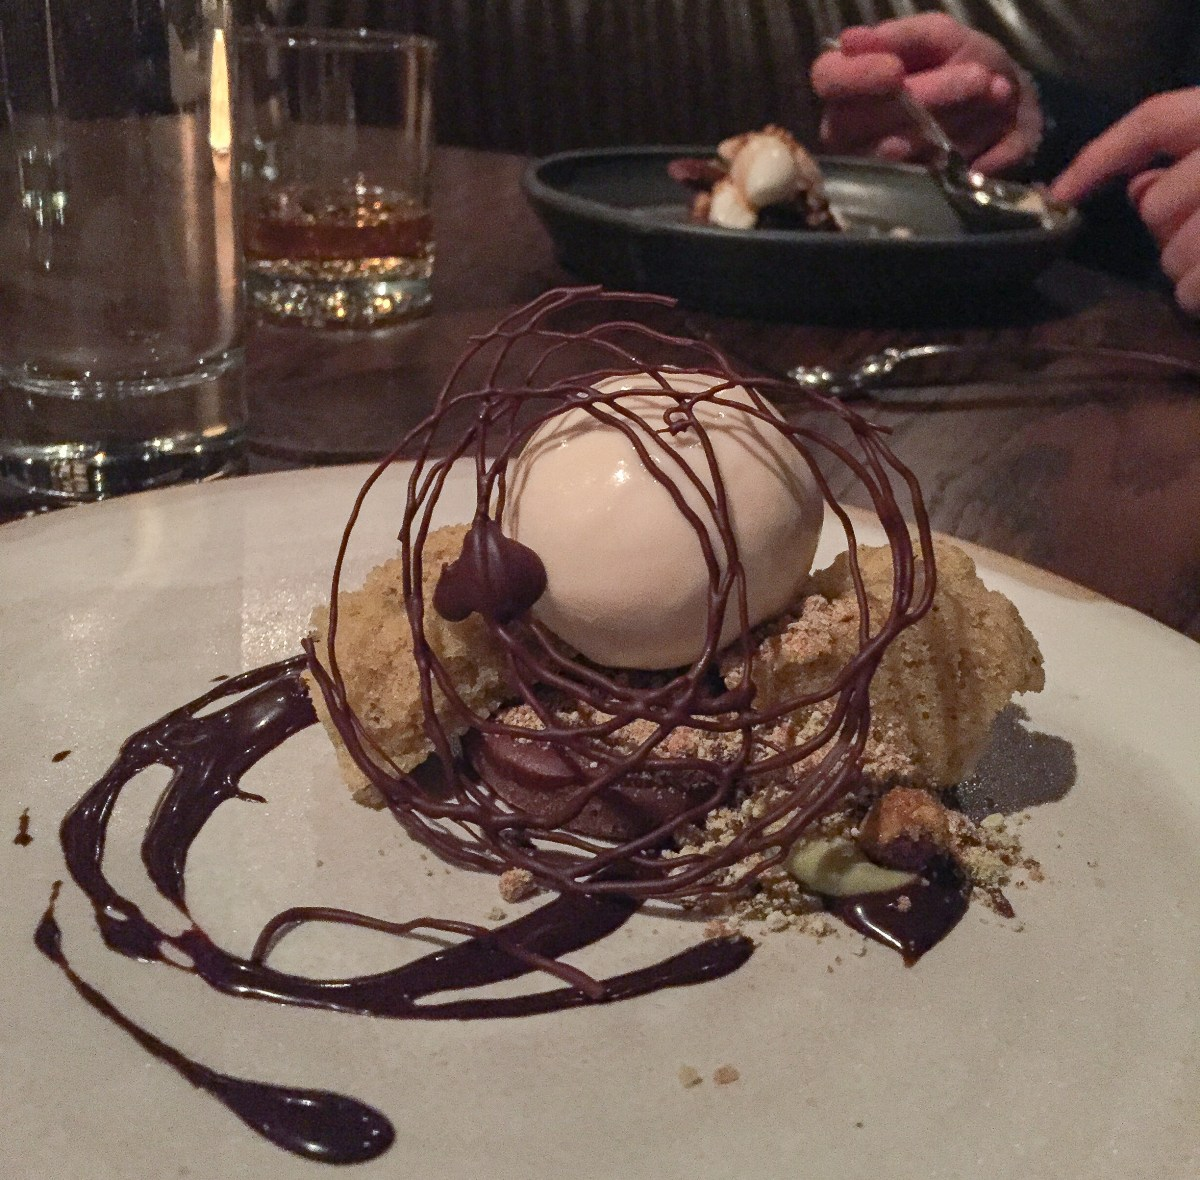 72 Hours in Chicago Dessert at Boka